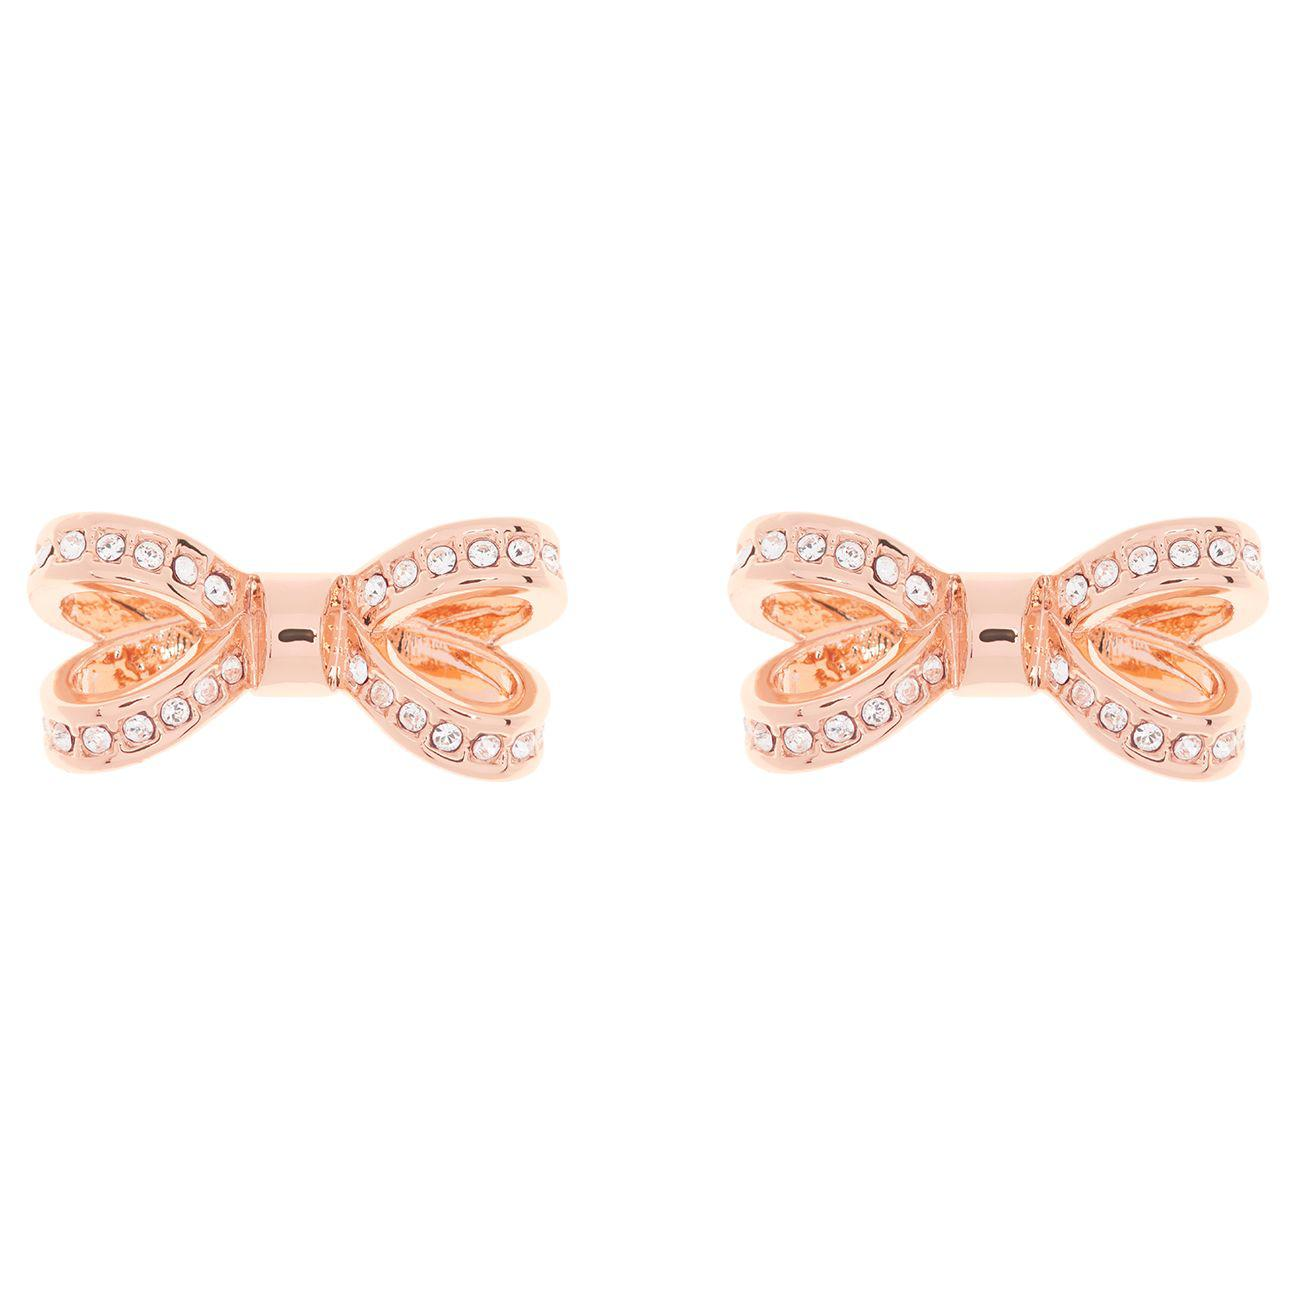 e661fc48a Ted Baker Olitta Mini Pave Swarovski Crystal Bow Stud Earrings in ...